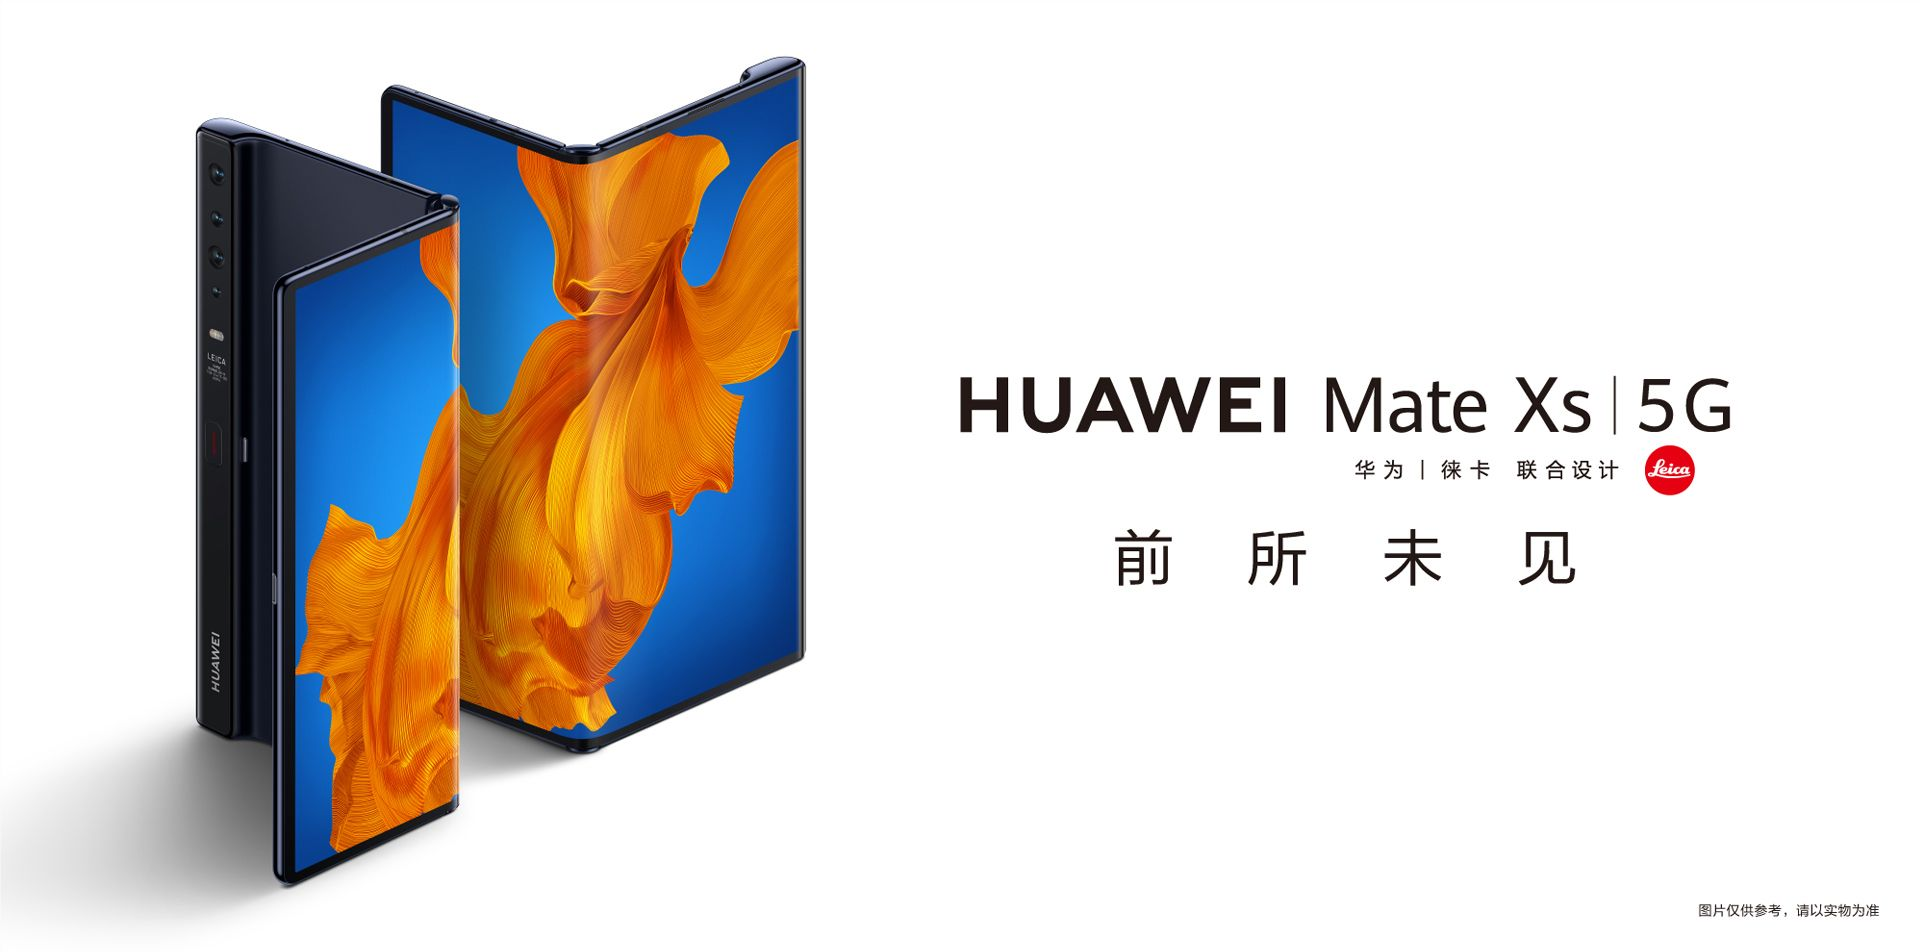 HUAWEIがMate X/Mate Xs後継となるフォルダブルスマートフォンを開発中、Galaxy Z Fold2 5Gと同じ内側に折りたたむ構造を採用